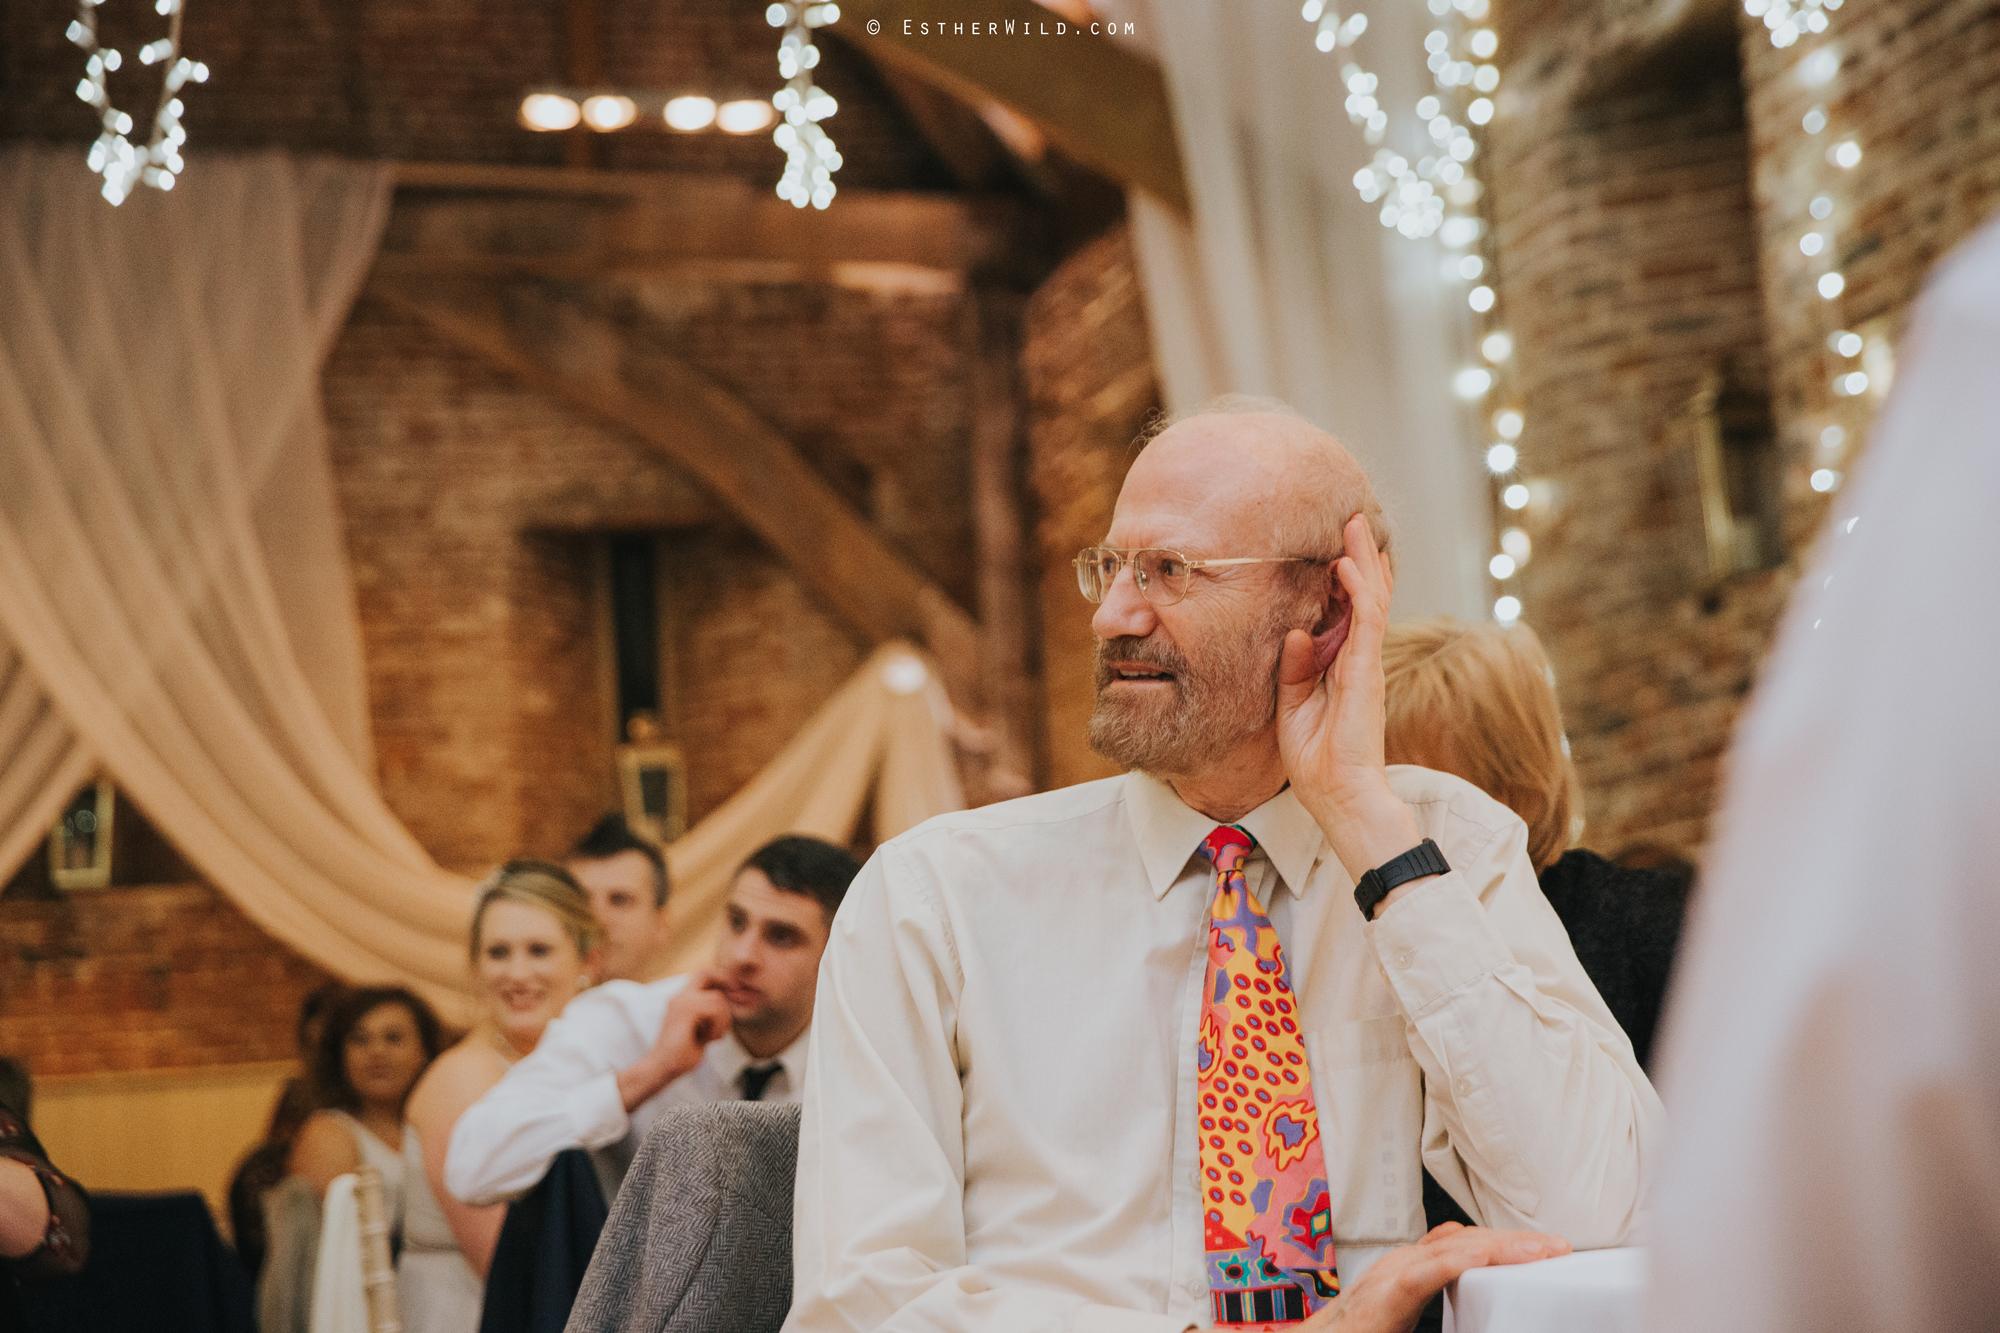 Elms_Barn_Weddings_Suffolk_Photographer_Copyright_Esther_Wild_IMG_2523.jpg